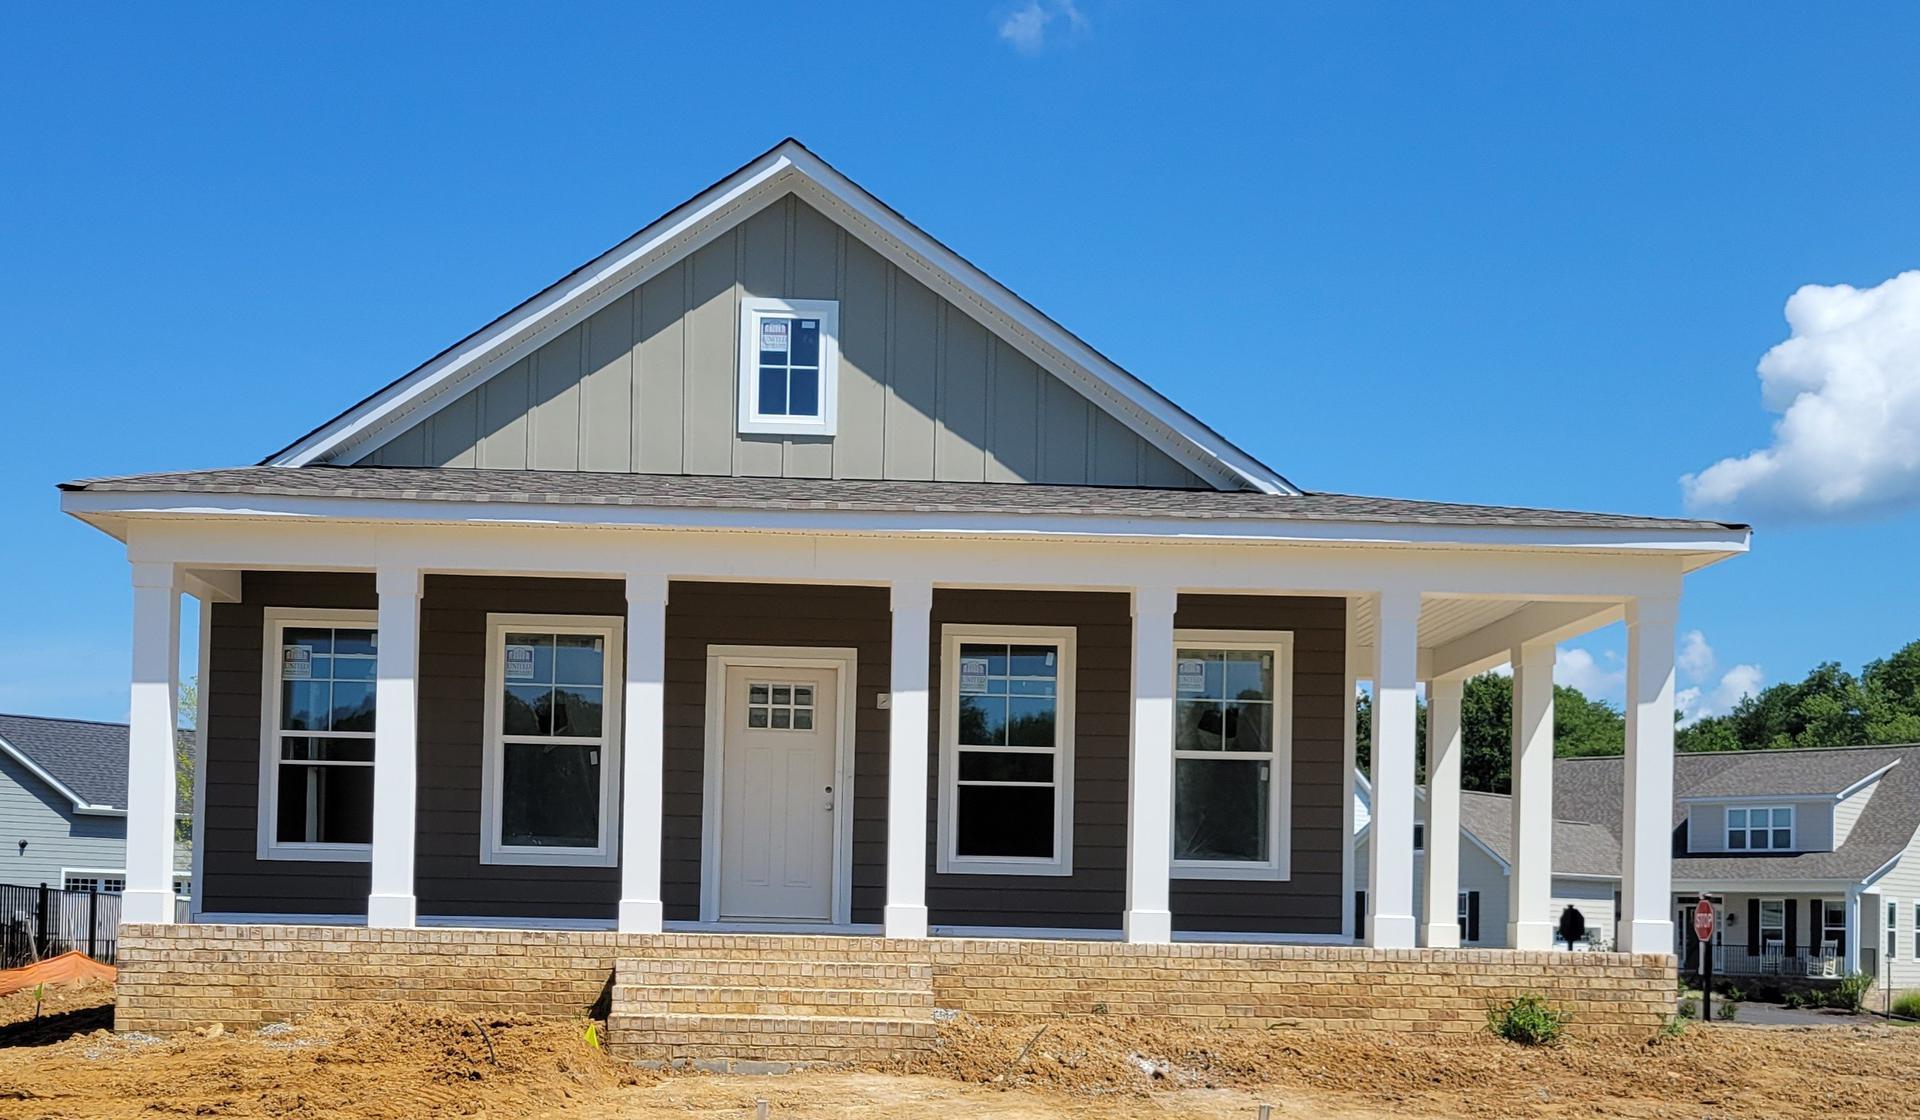 702 W. Vaughan Road, Ashland, VA 23005 Home for Sale